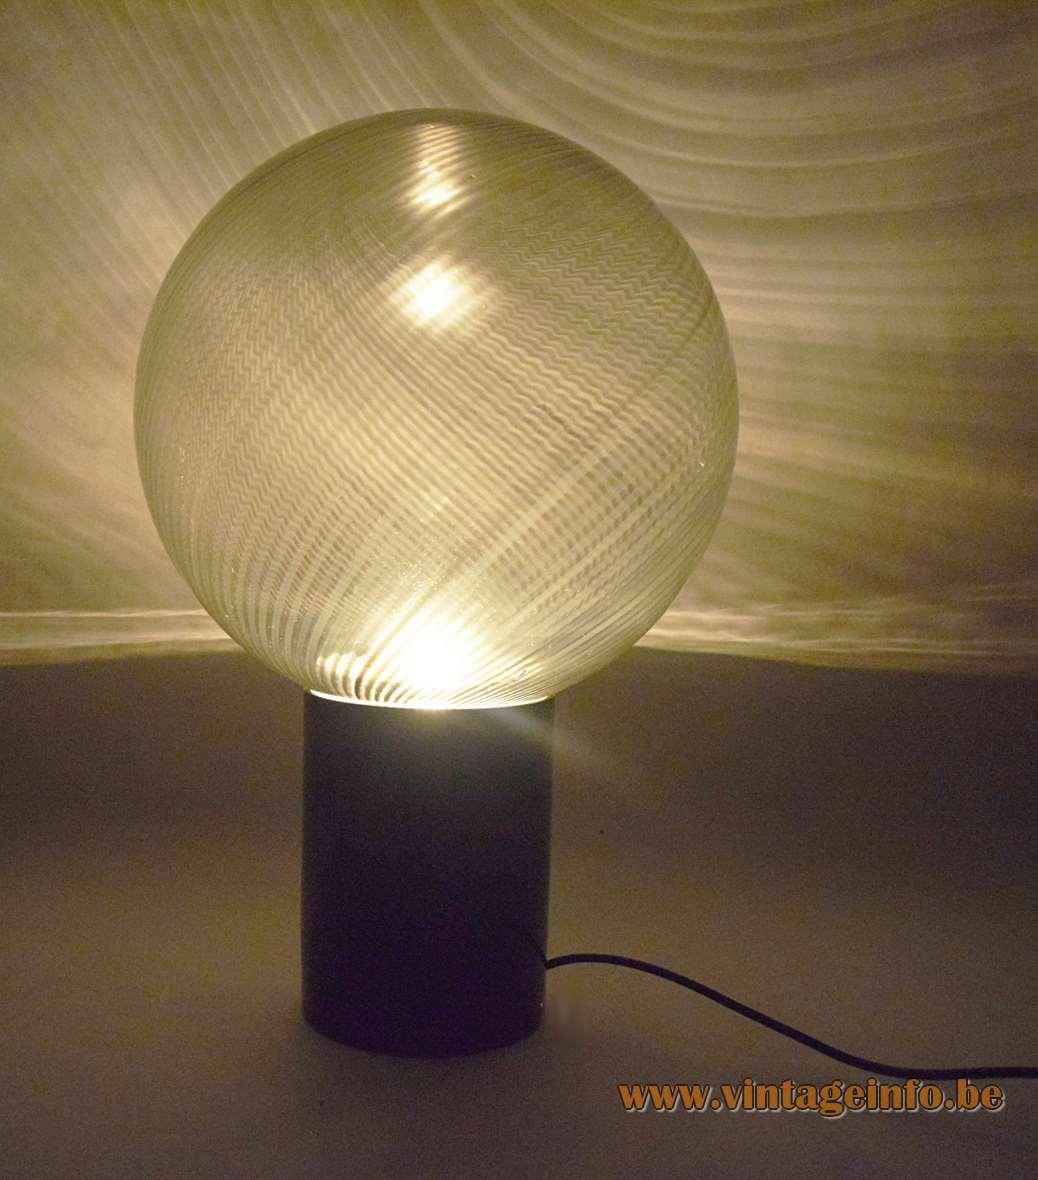 Lino Tagliapietra Globe Table Lamp 1970s La Murrina Murano Italy stripes glass black ball hand blown